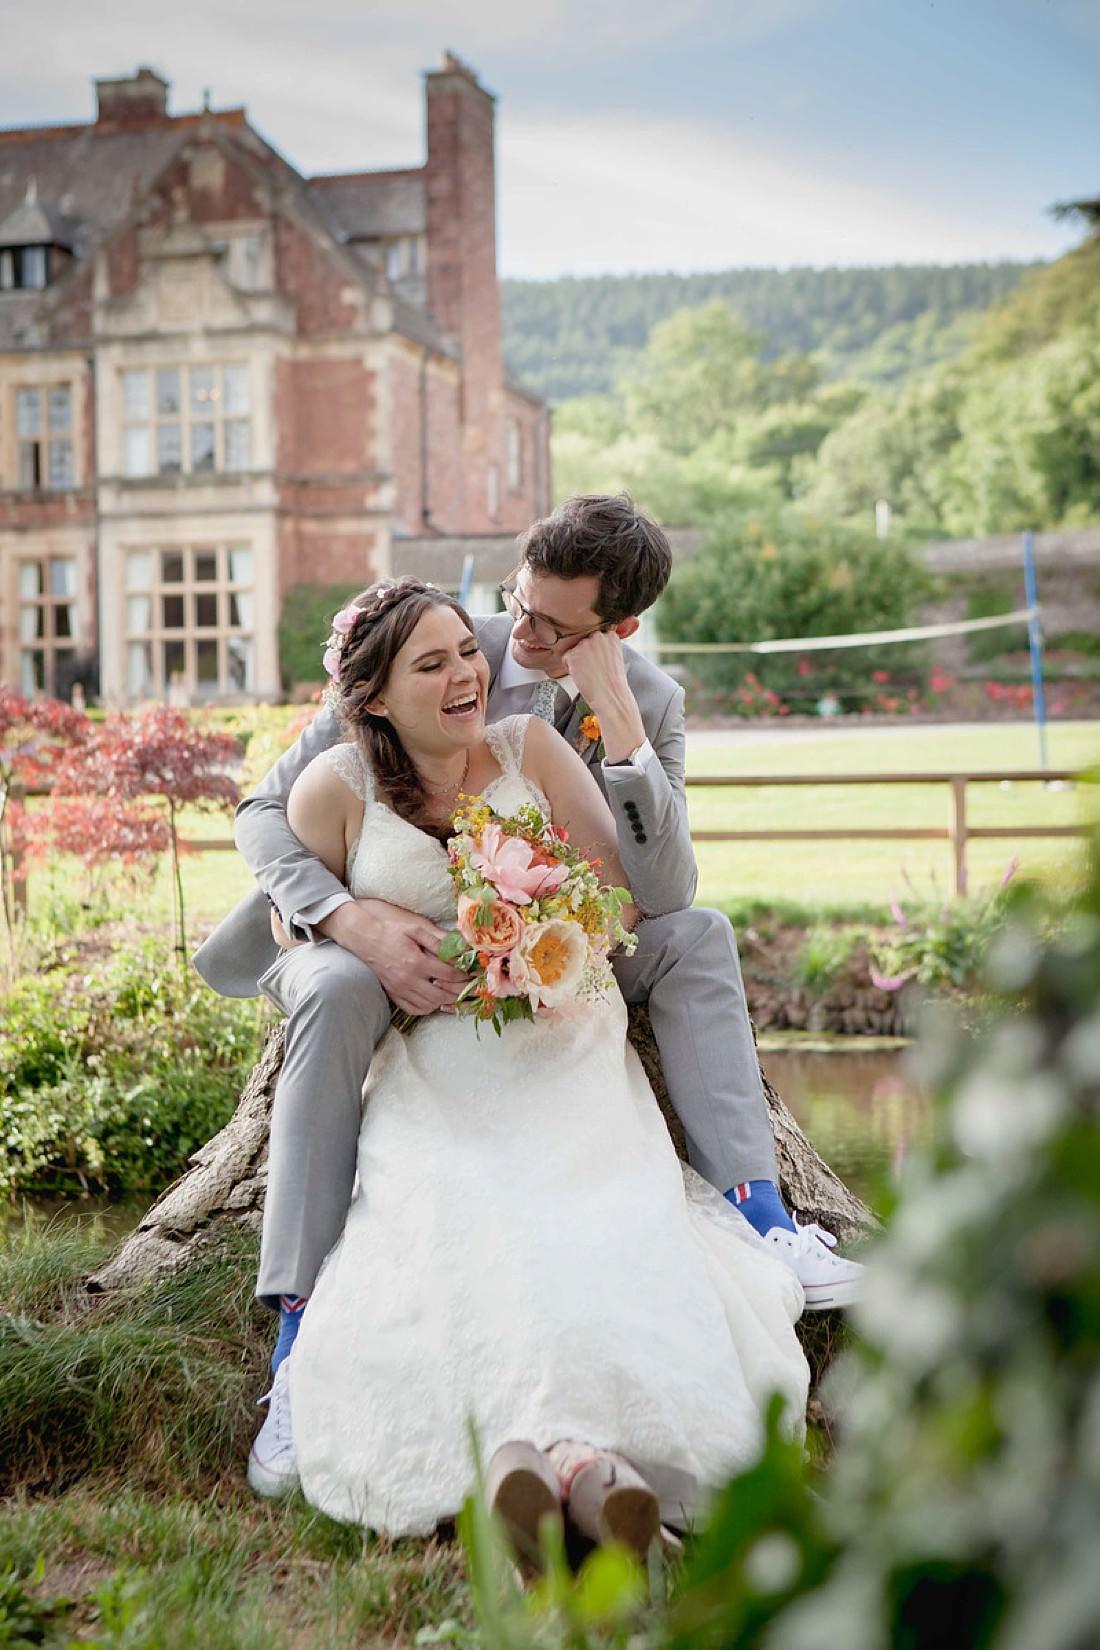 Christian Michael Photography Wedding Photographer based in Wedding photographers in somerset